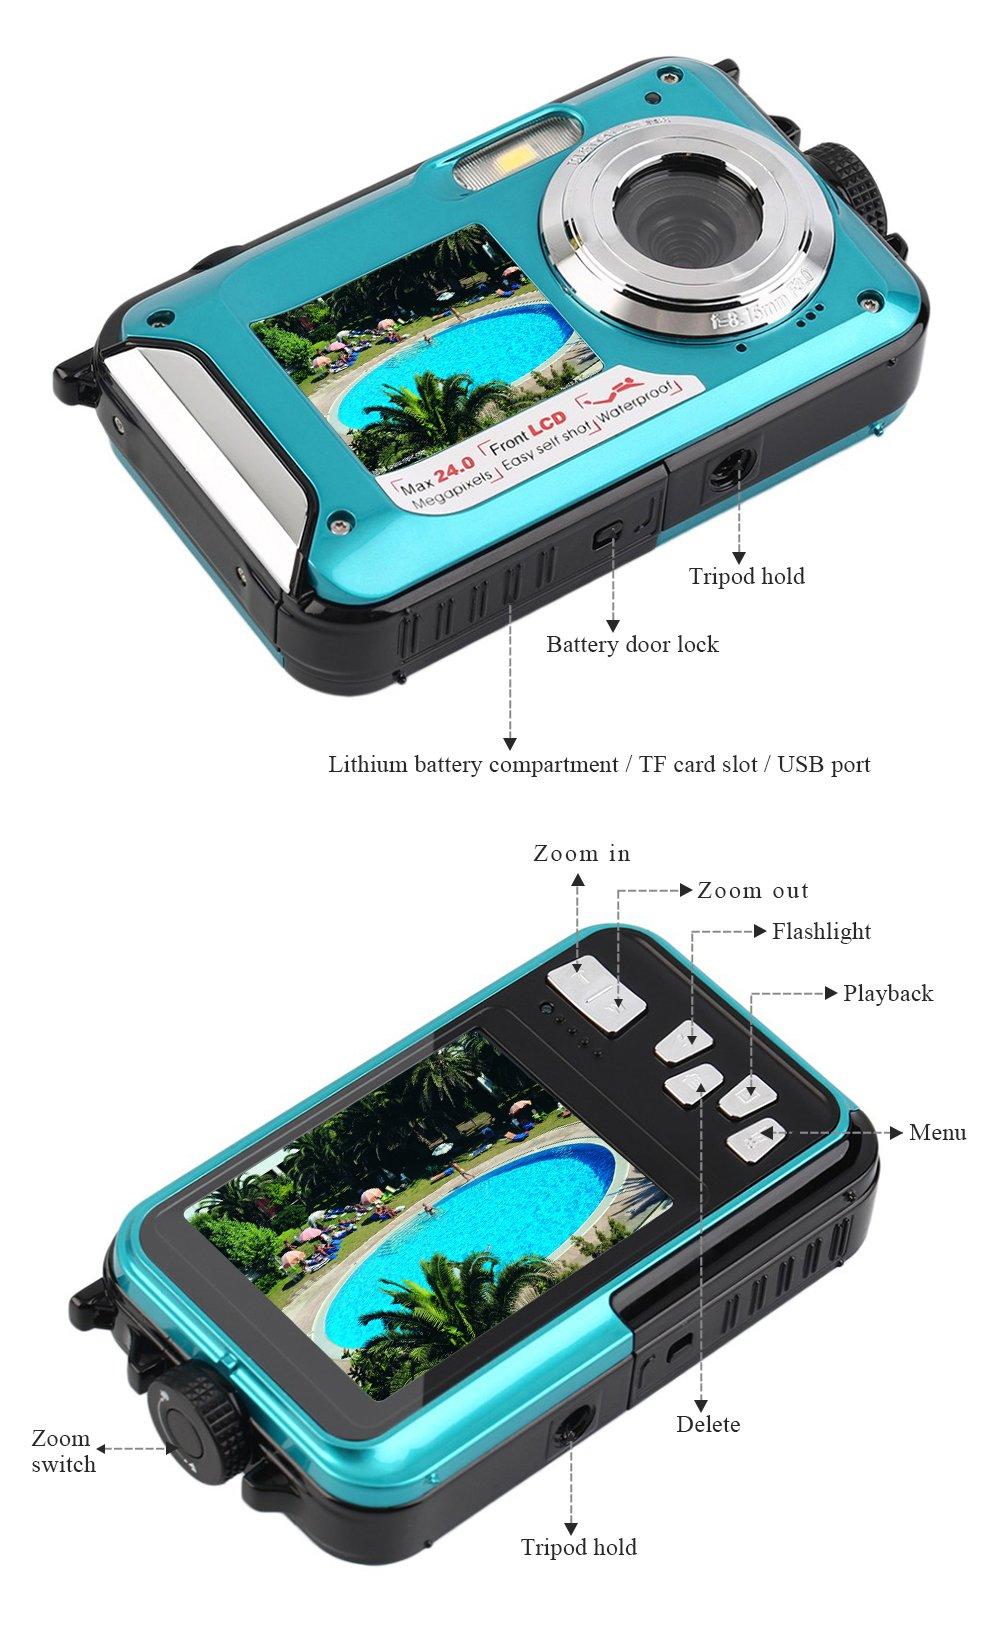 YISENCE Waterproof Digital Camera 24MP Underwater Camcorder Video Recorder FULL HD 1080P Selfie Dual Screen DV Recording … (C8) by YISENCE (Image #5)